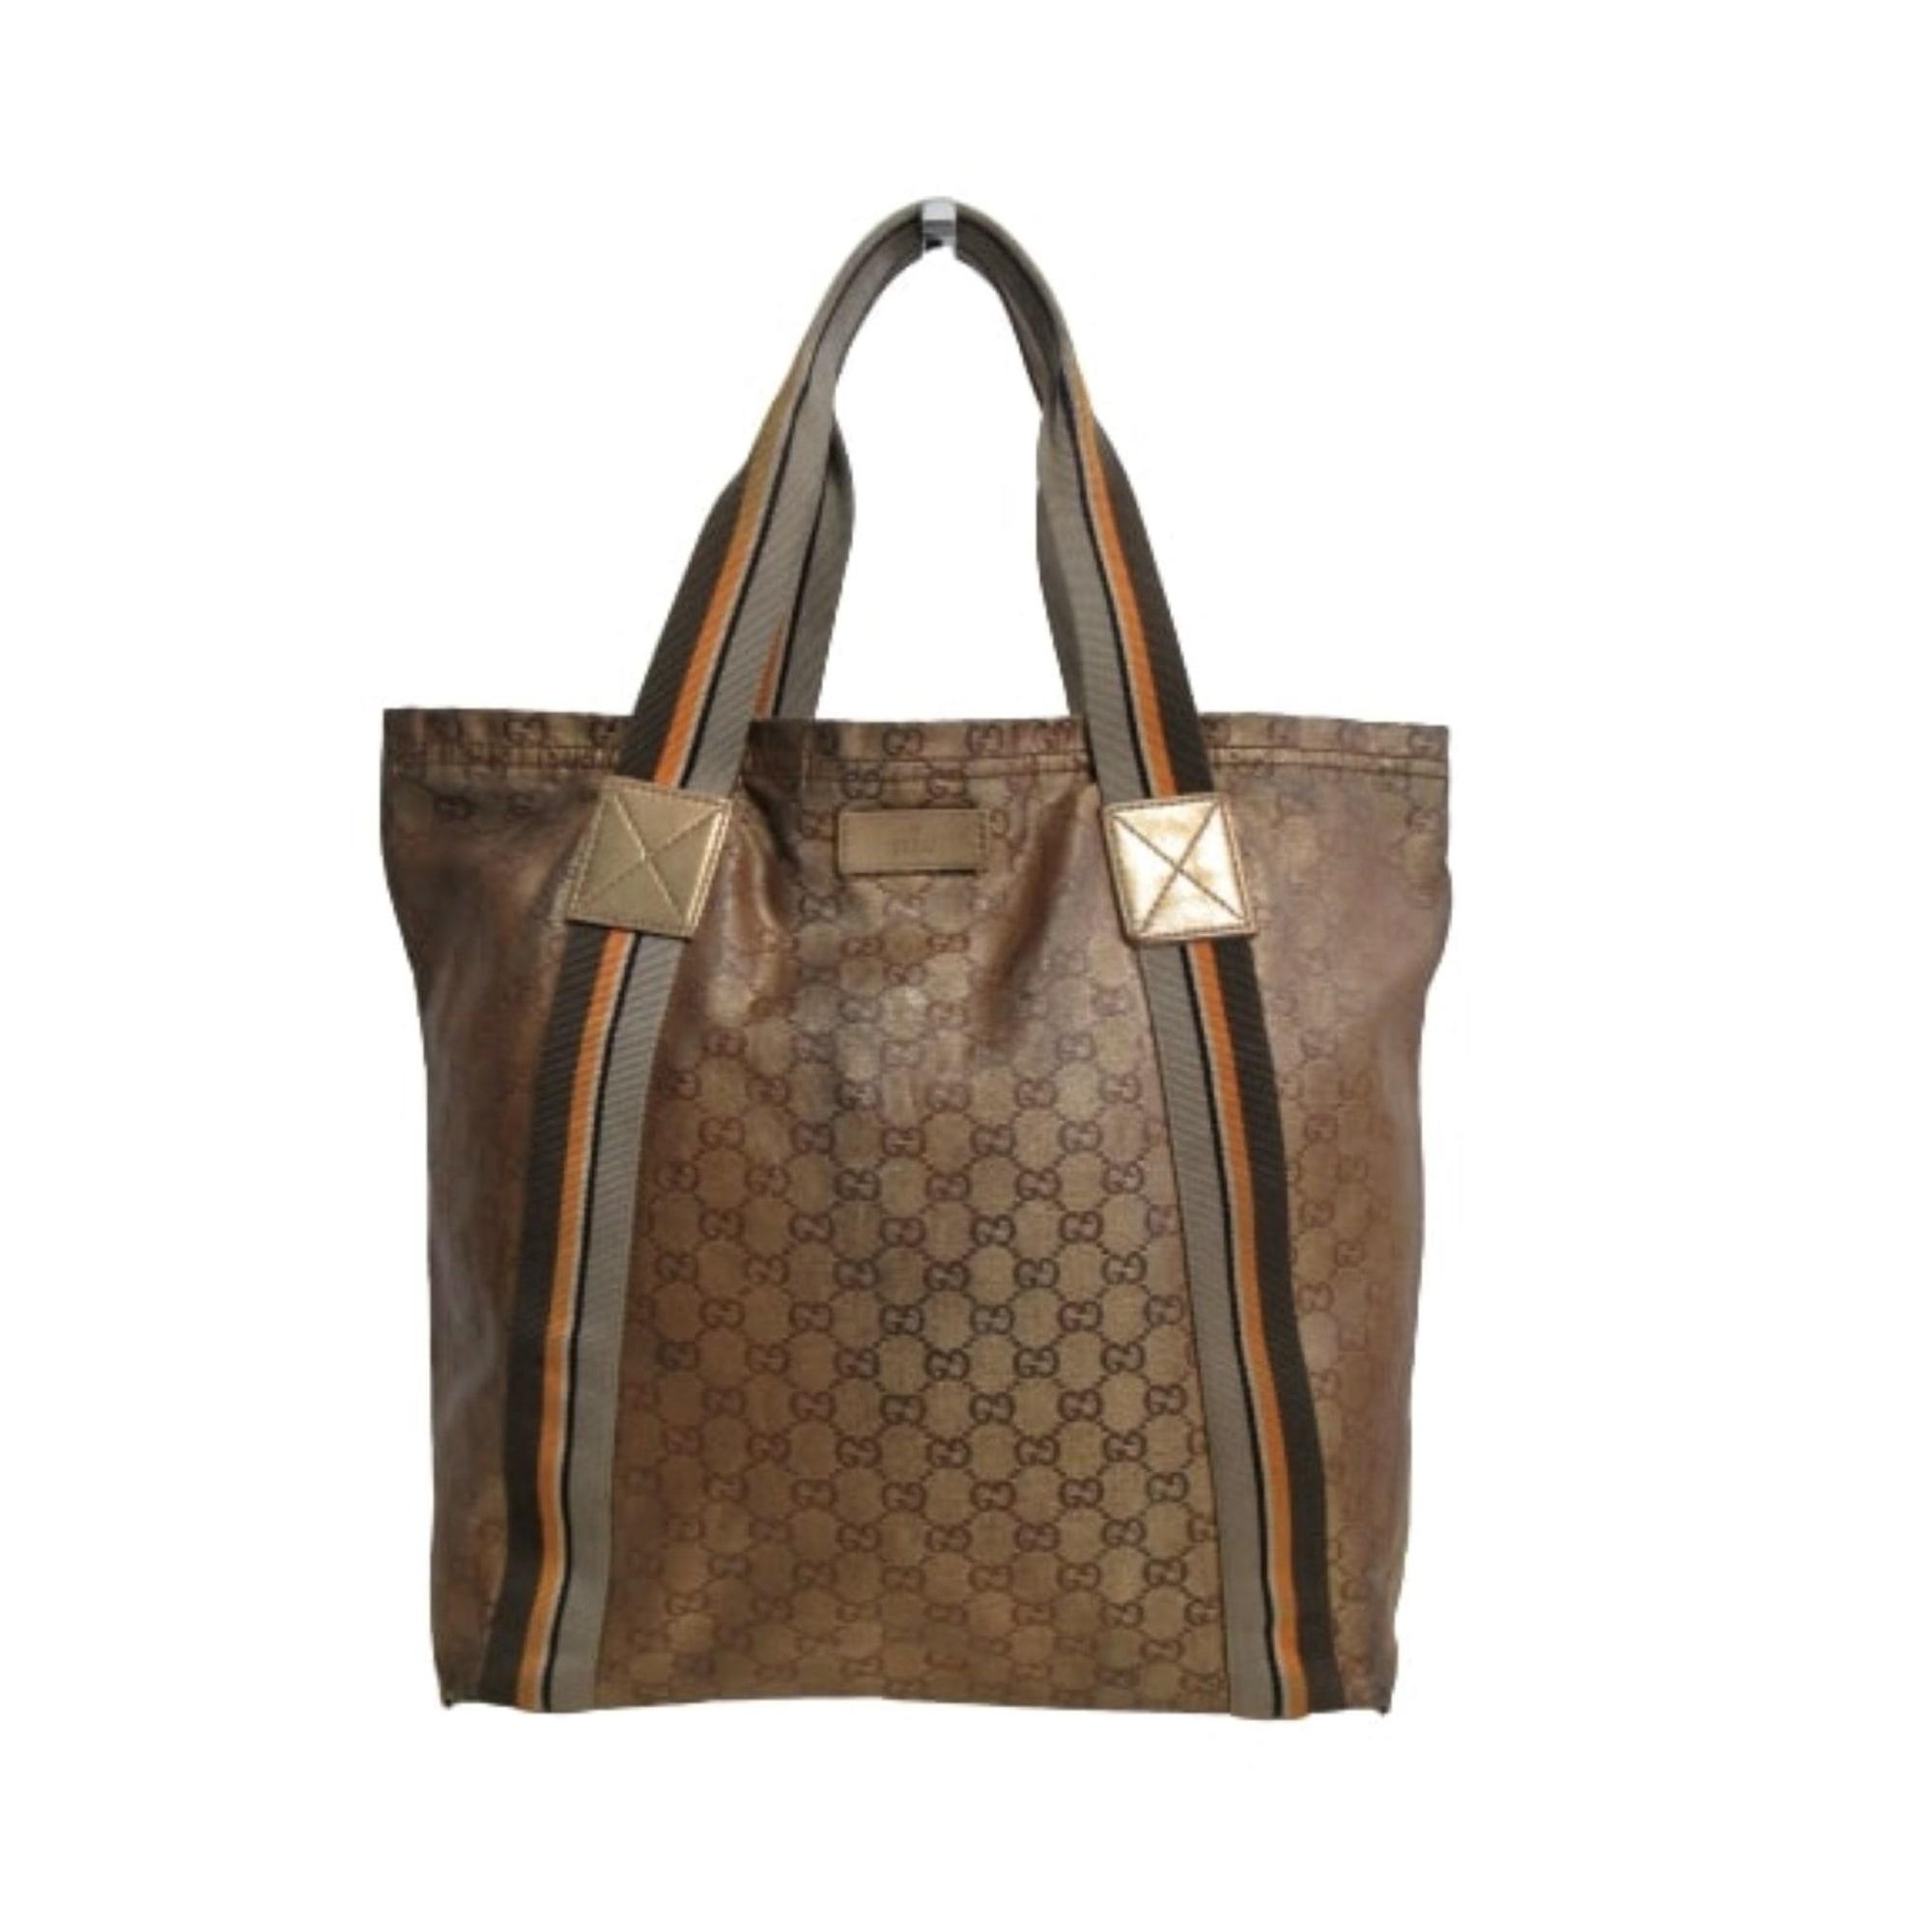 Sac XL en tissu GUCCI Doré, bronze, cuivre